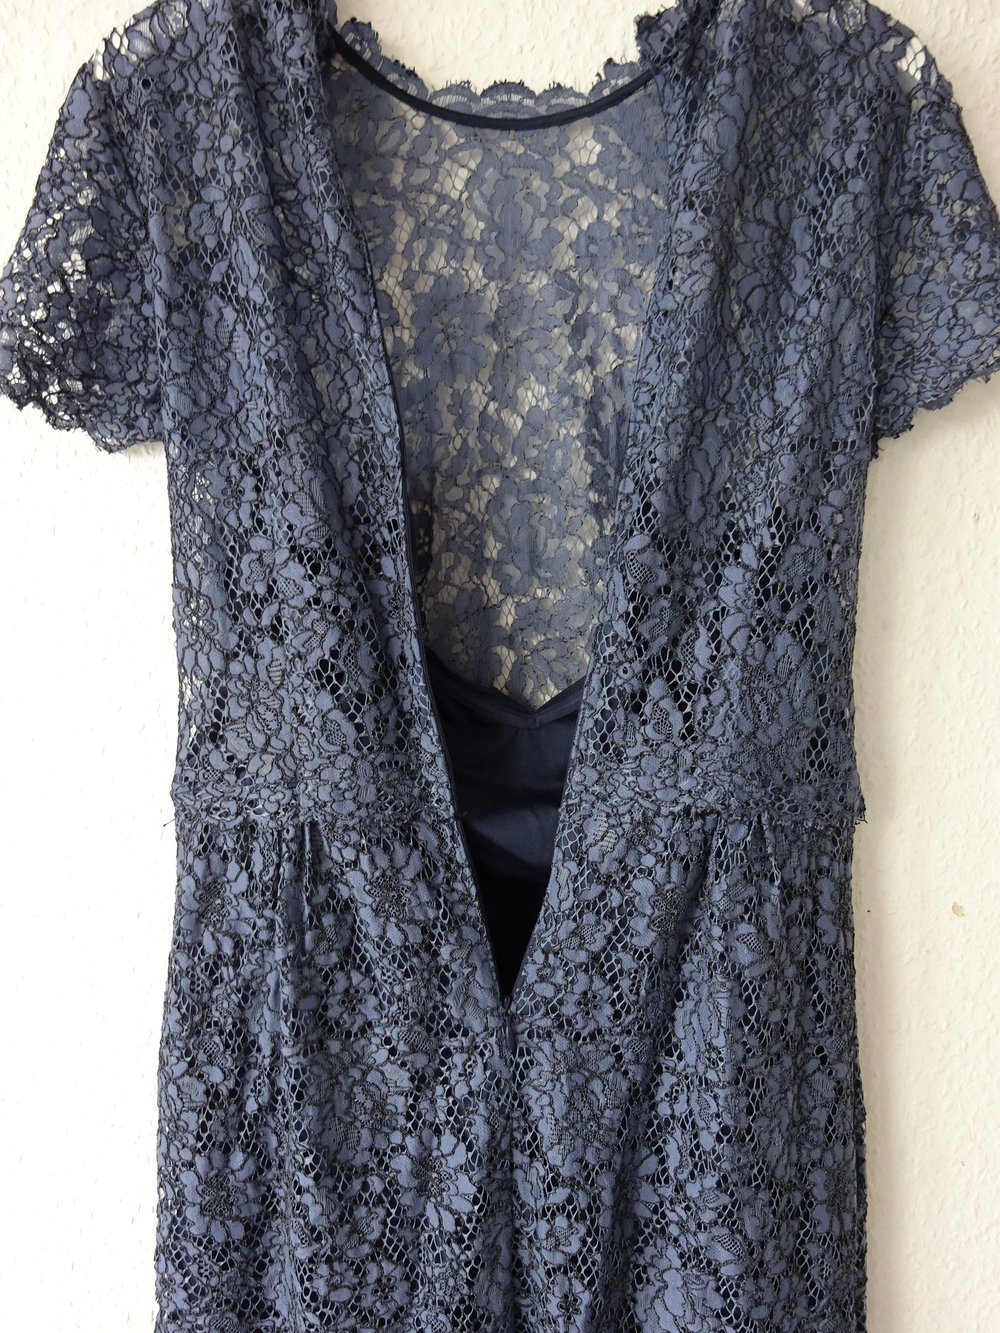 ... Bezauberndes elegantes blaues Spitzen Etuikleid von Esprit ... ebde16decd